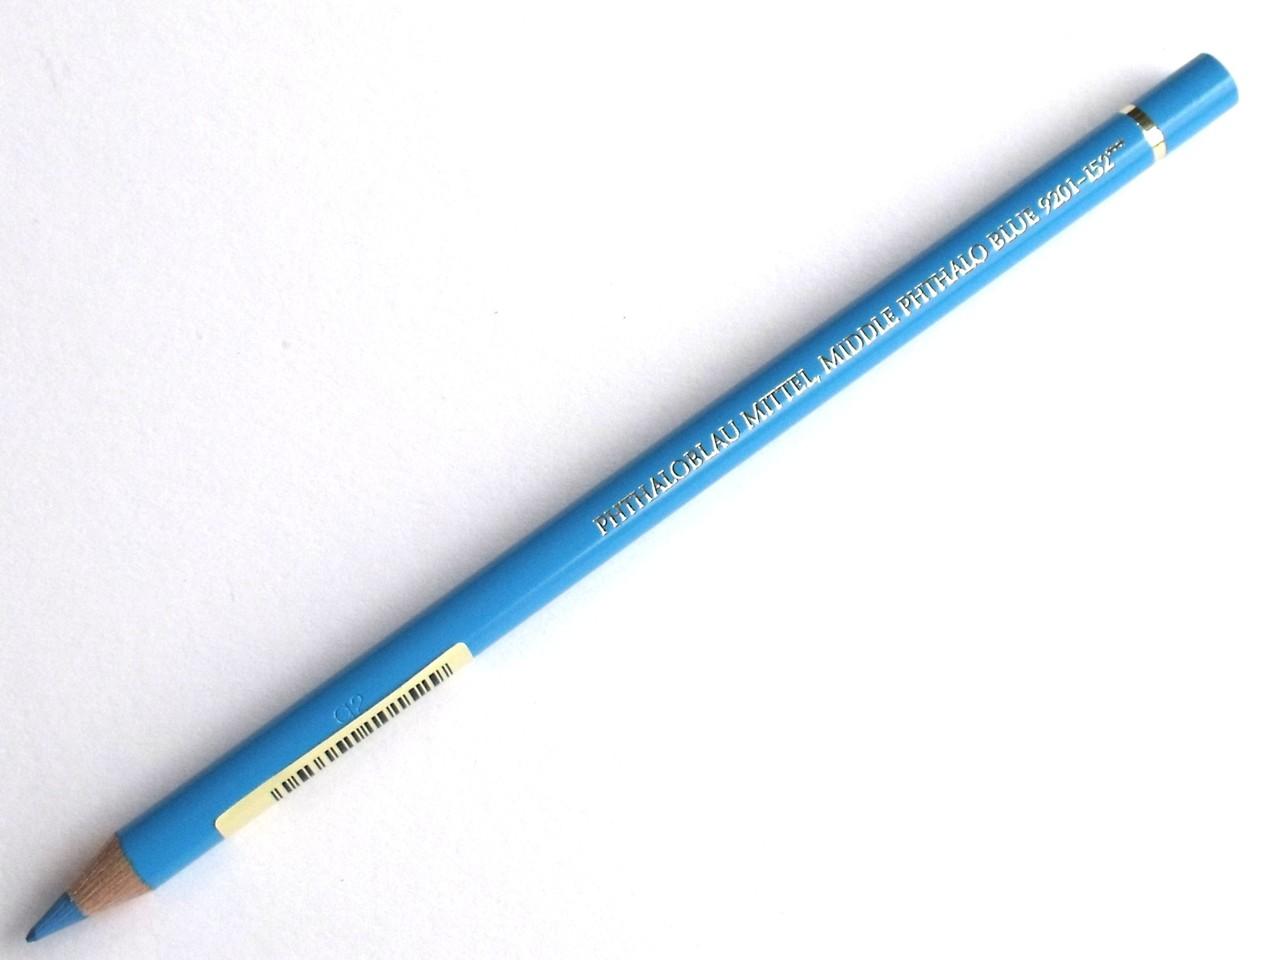 faber castell individual polychromos pencils 133 165. Black Bedroom Furniture Sets. Home Design Ideas